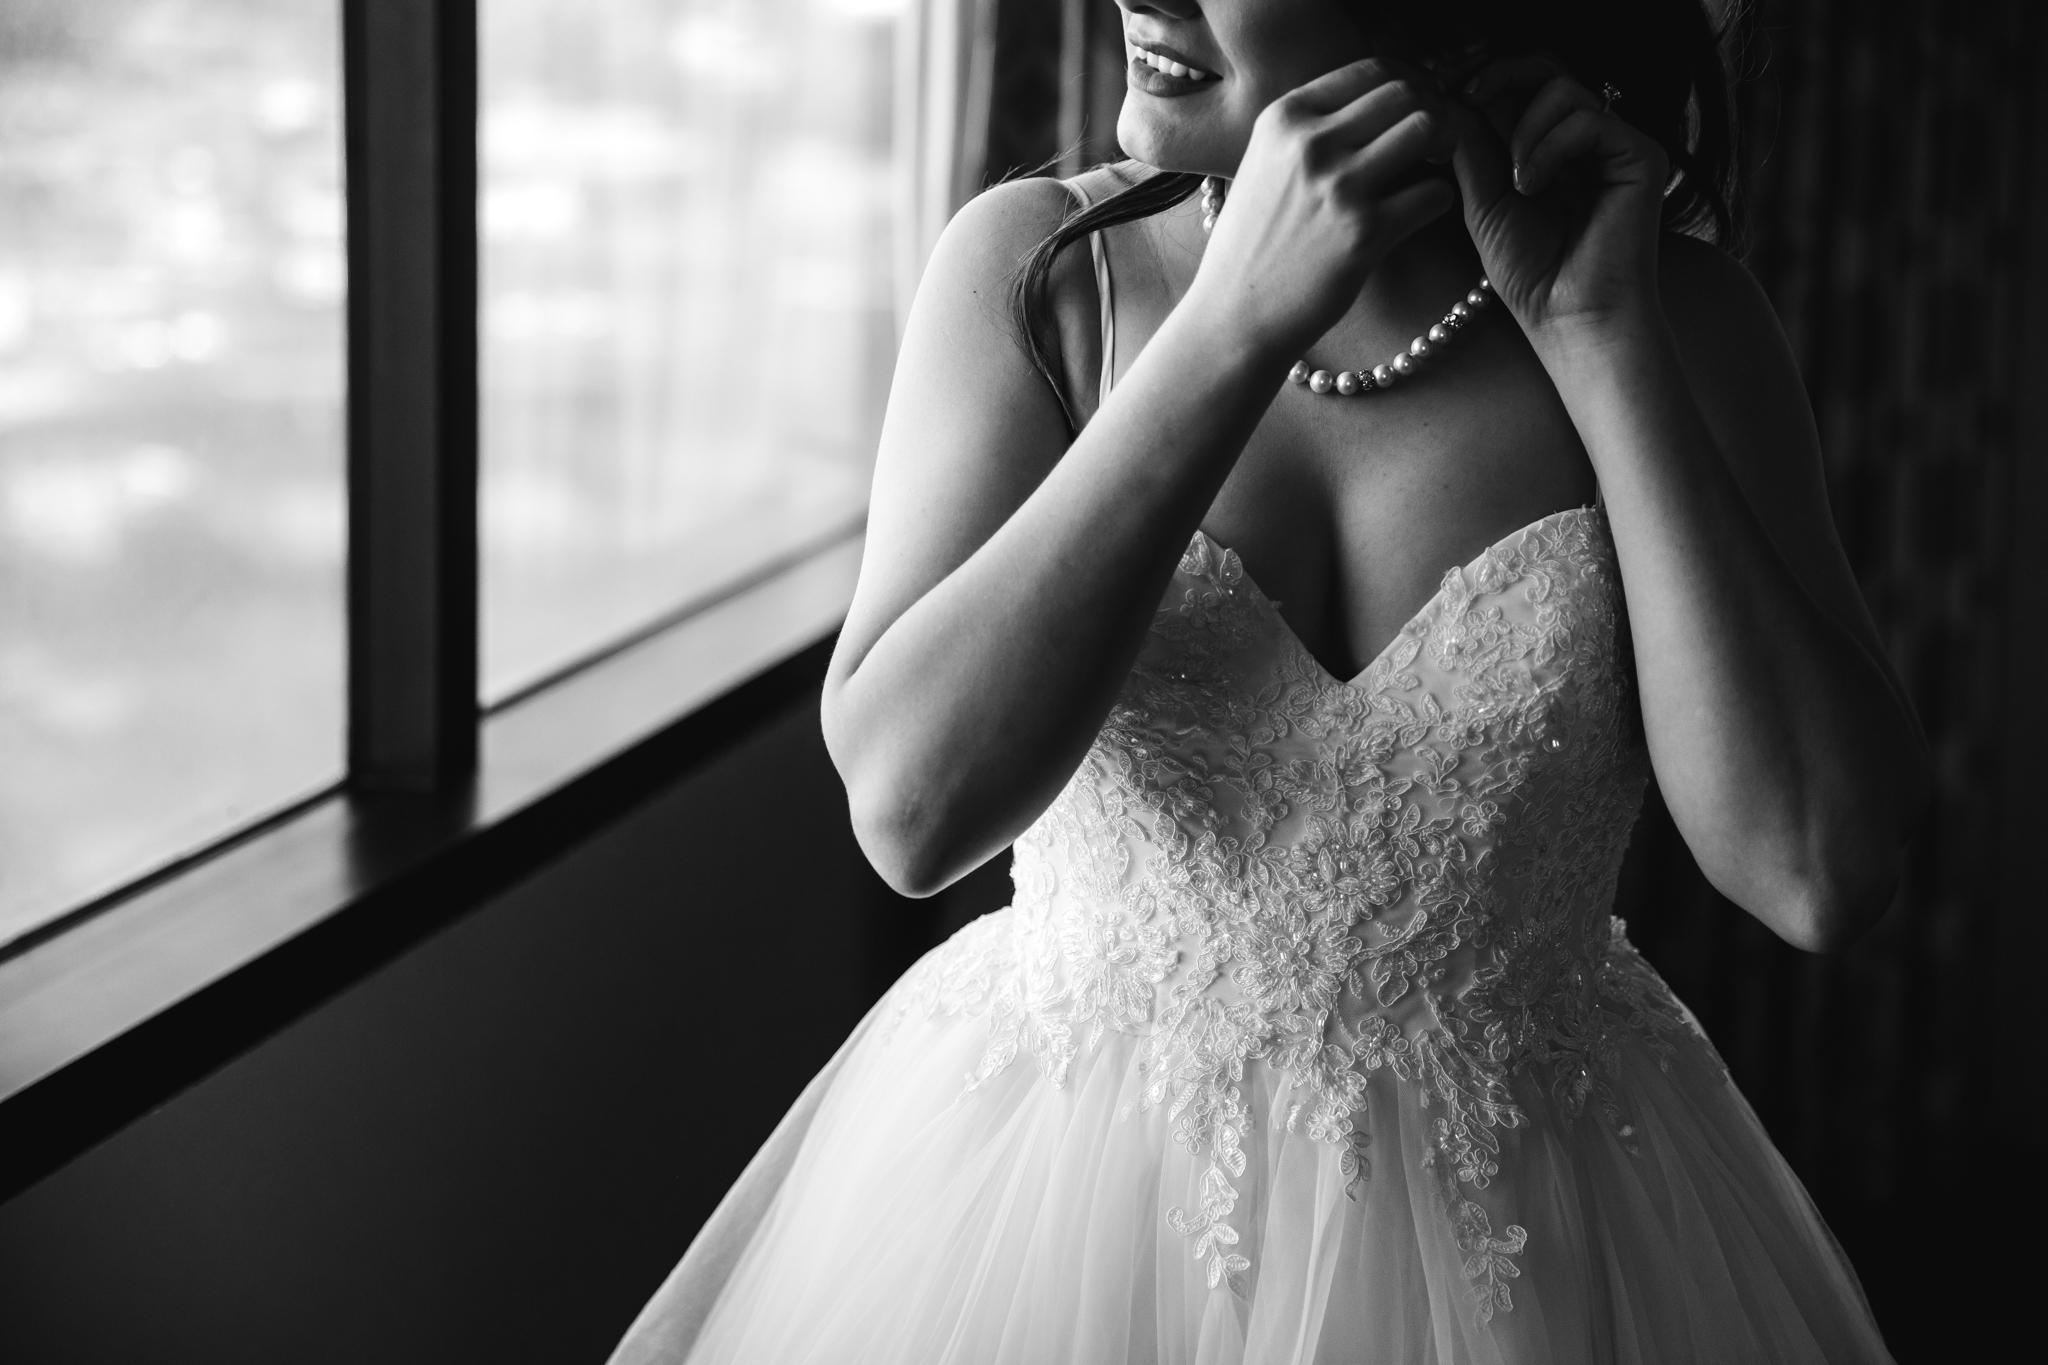 memphis-wedding-photographers-thewarmtharoundyou-ballinese-ballroom (47 of 232).jpg